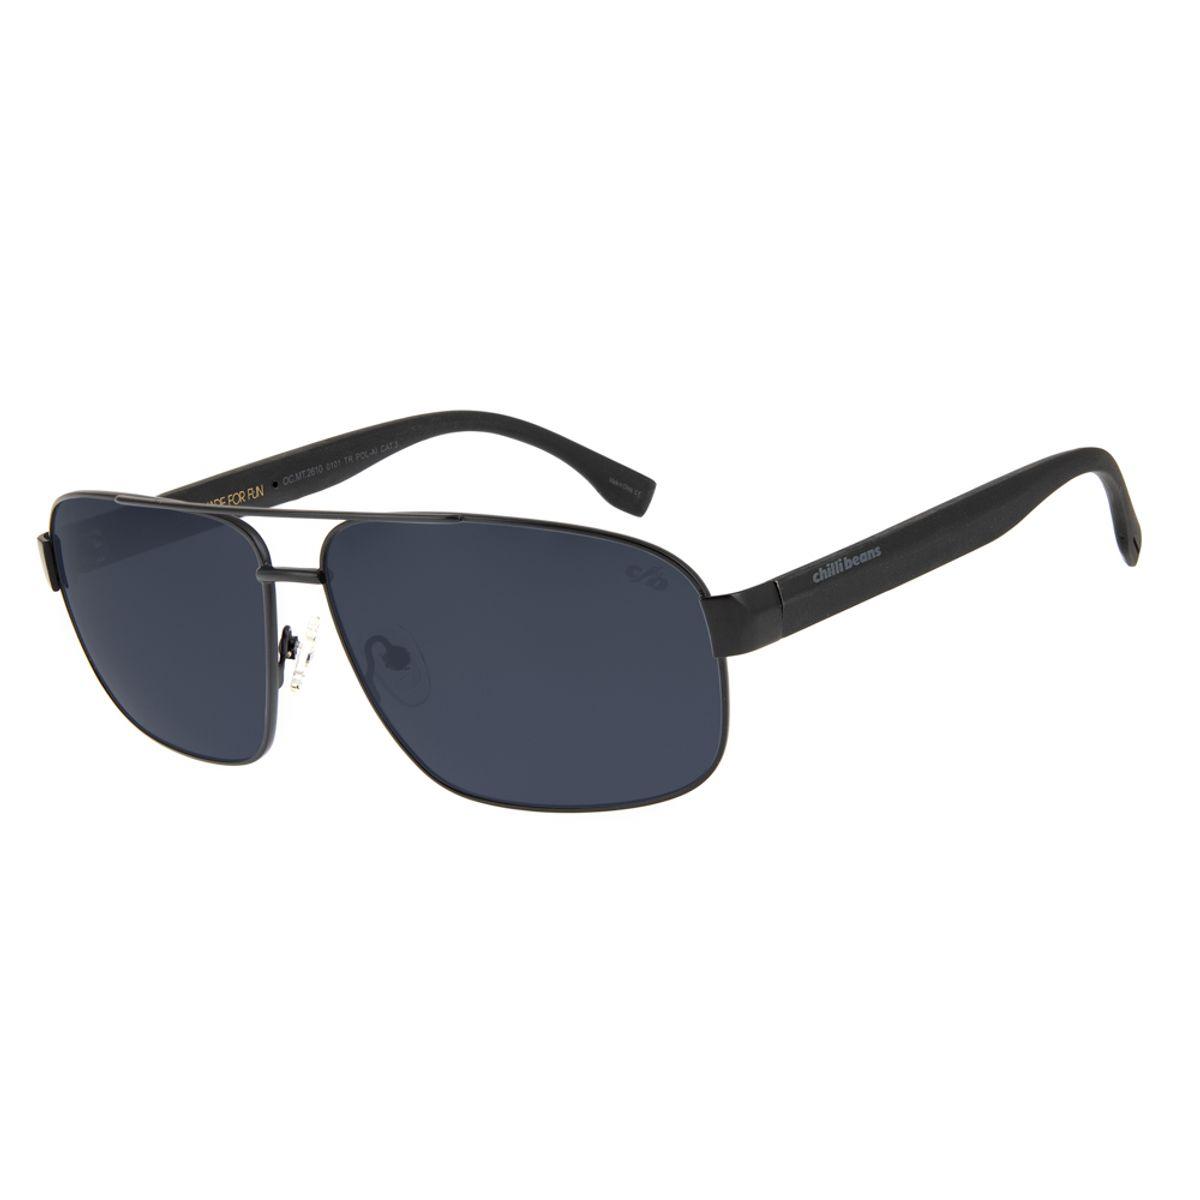 458324fe5 Óculos de Sol Chilli Beans Masculino Metal Army Polarizado Preto ...